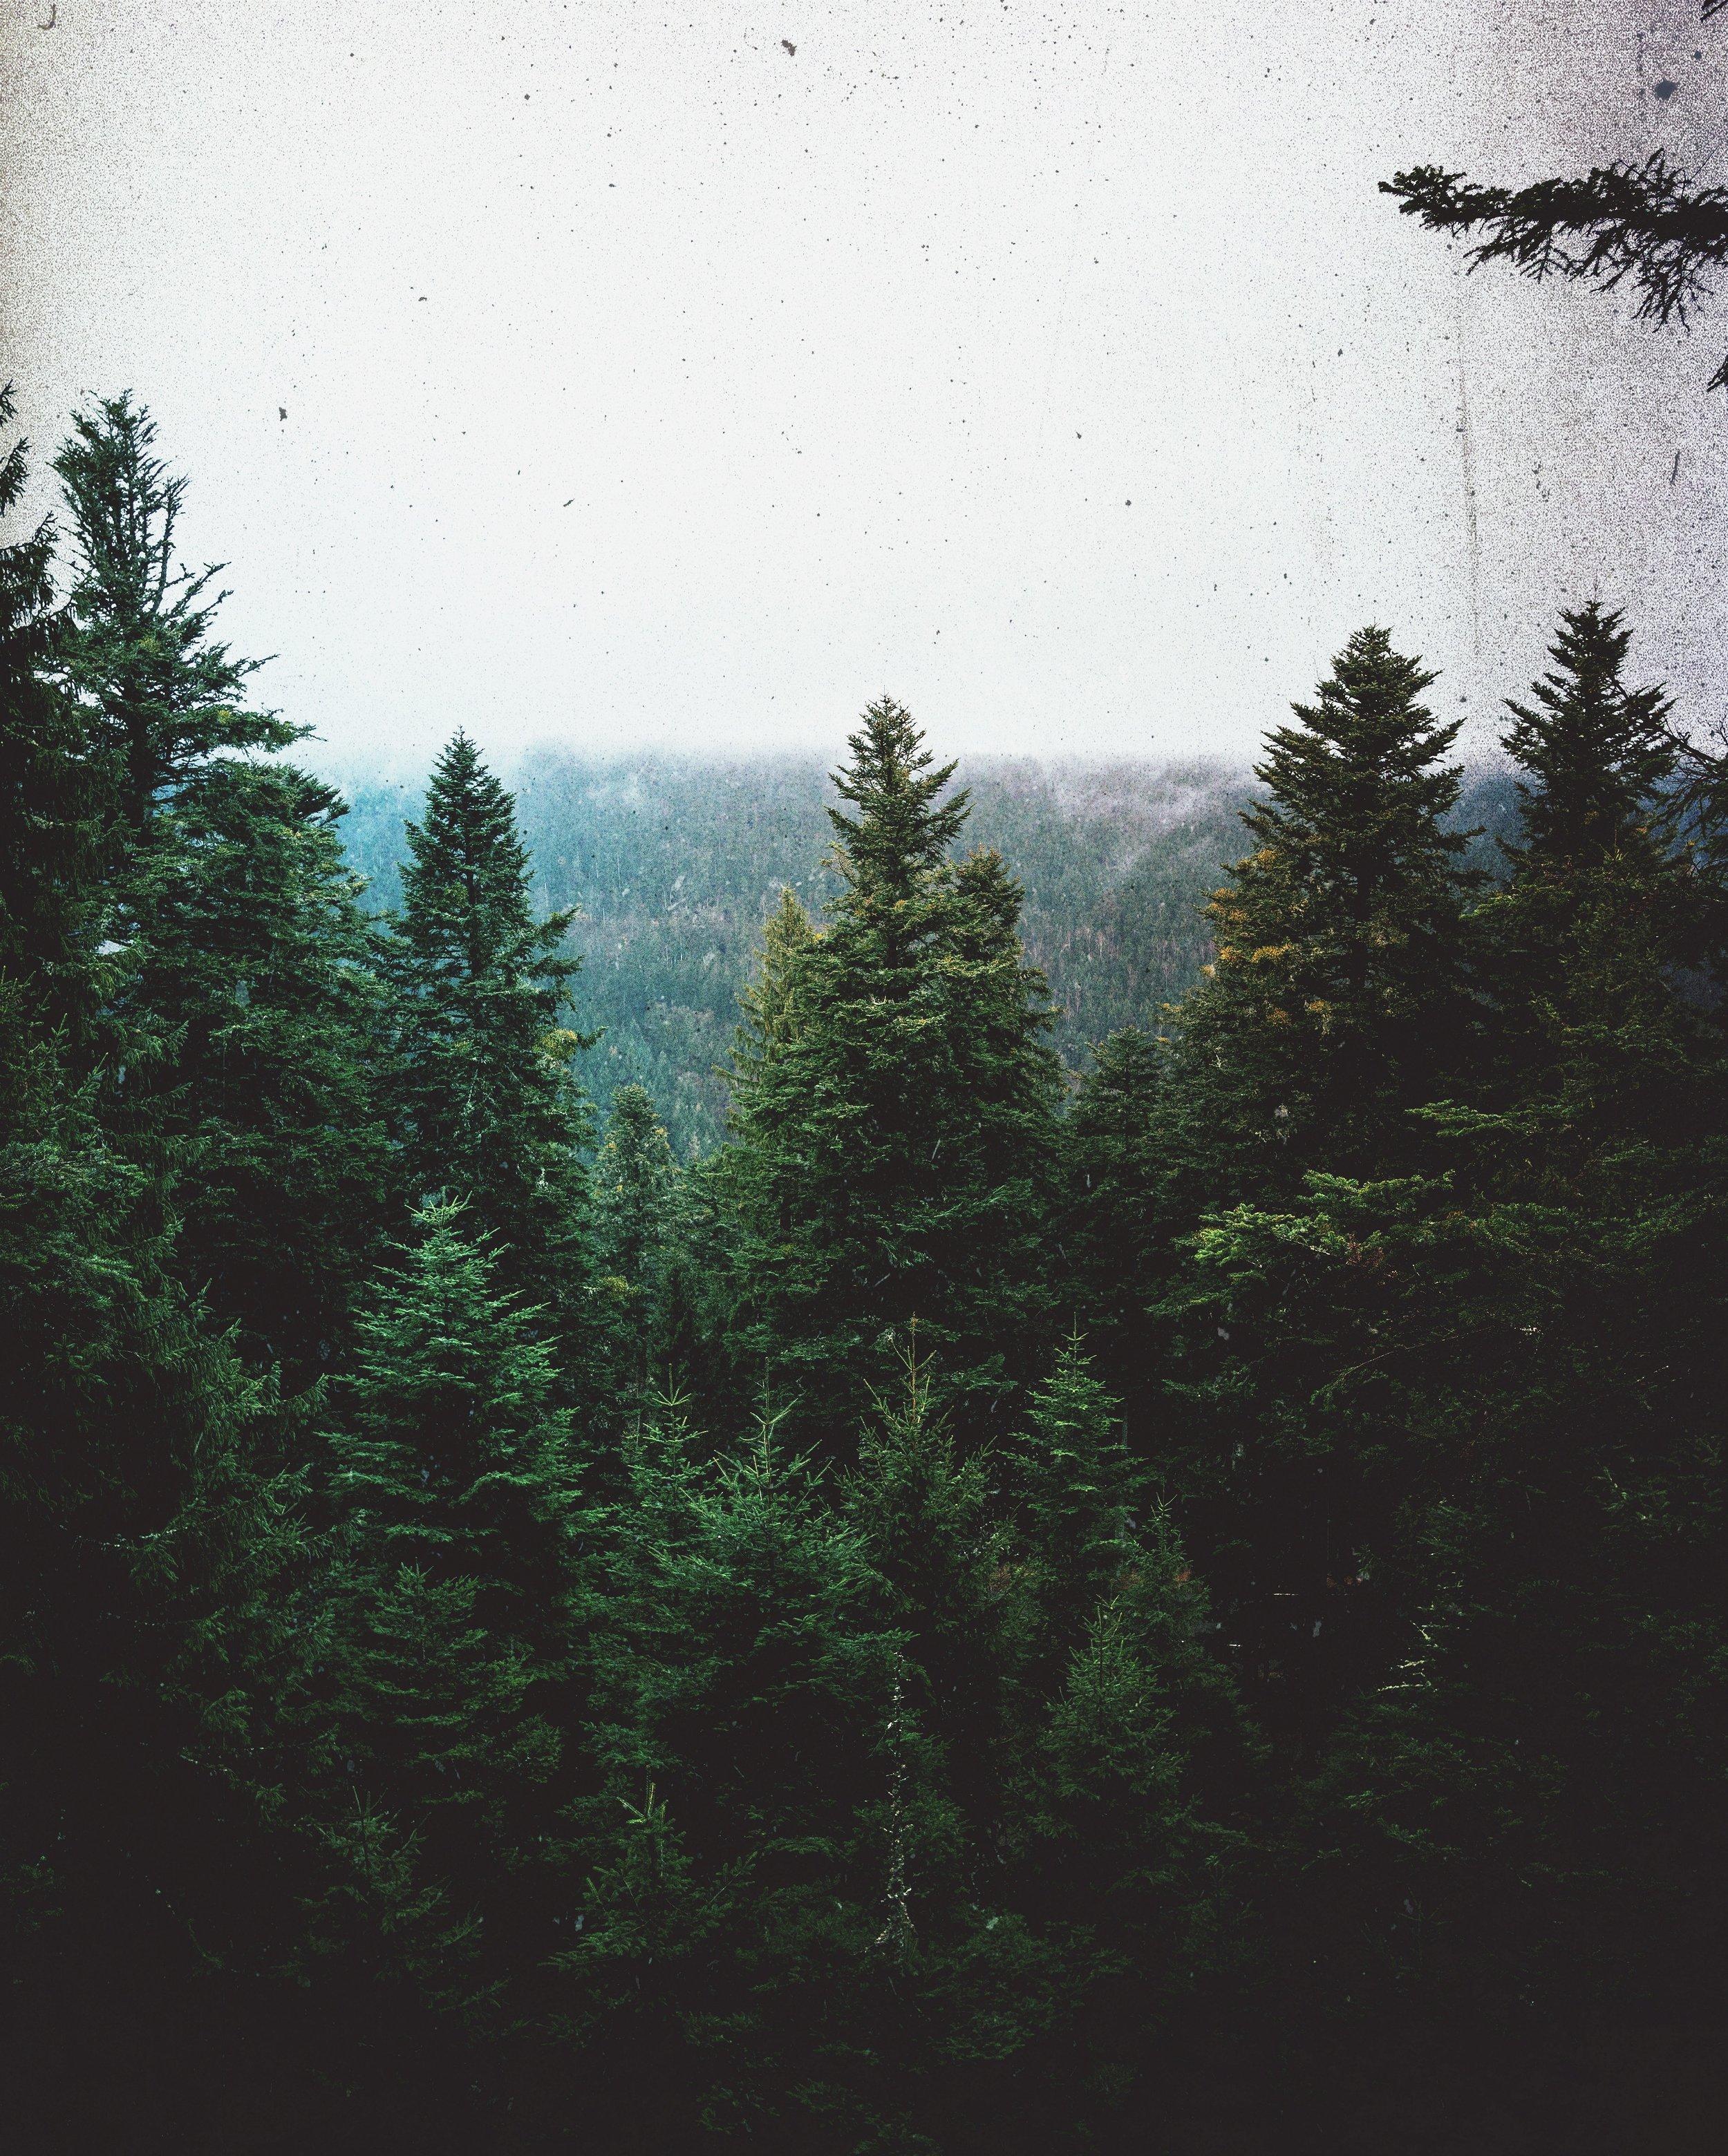 Black Forest 1 EDIT.jpeg